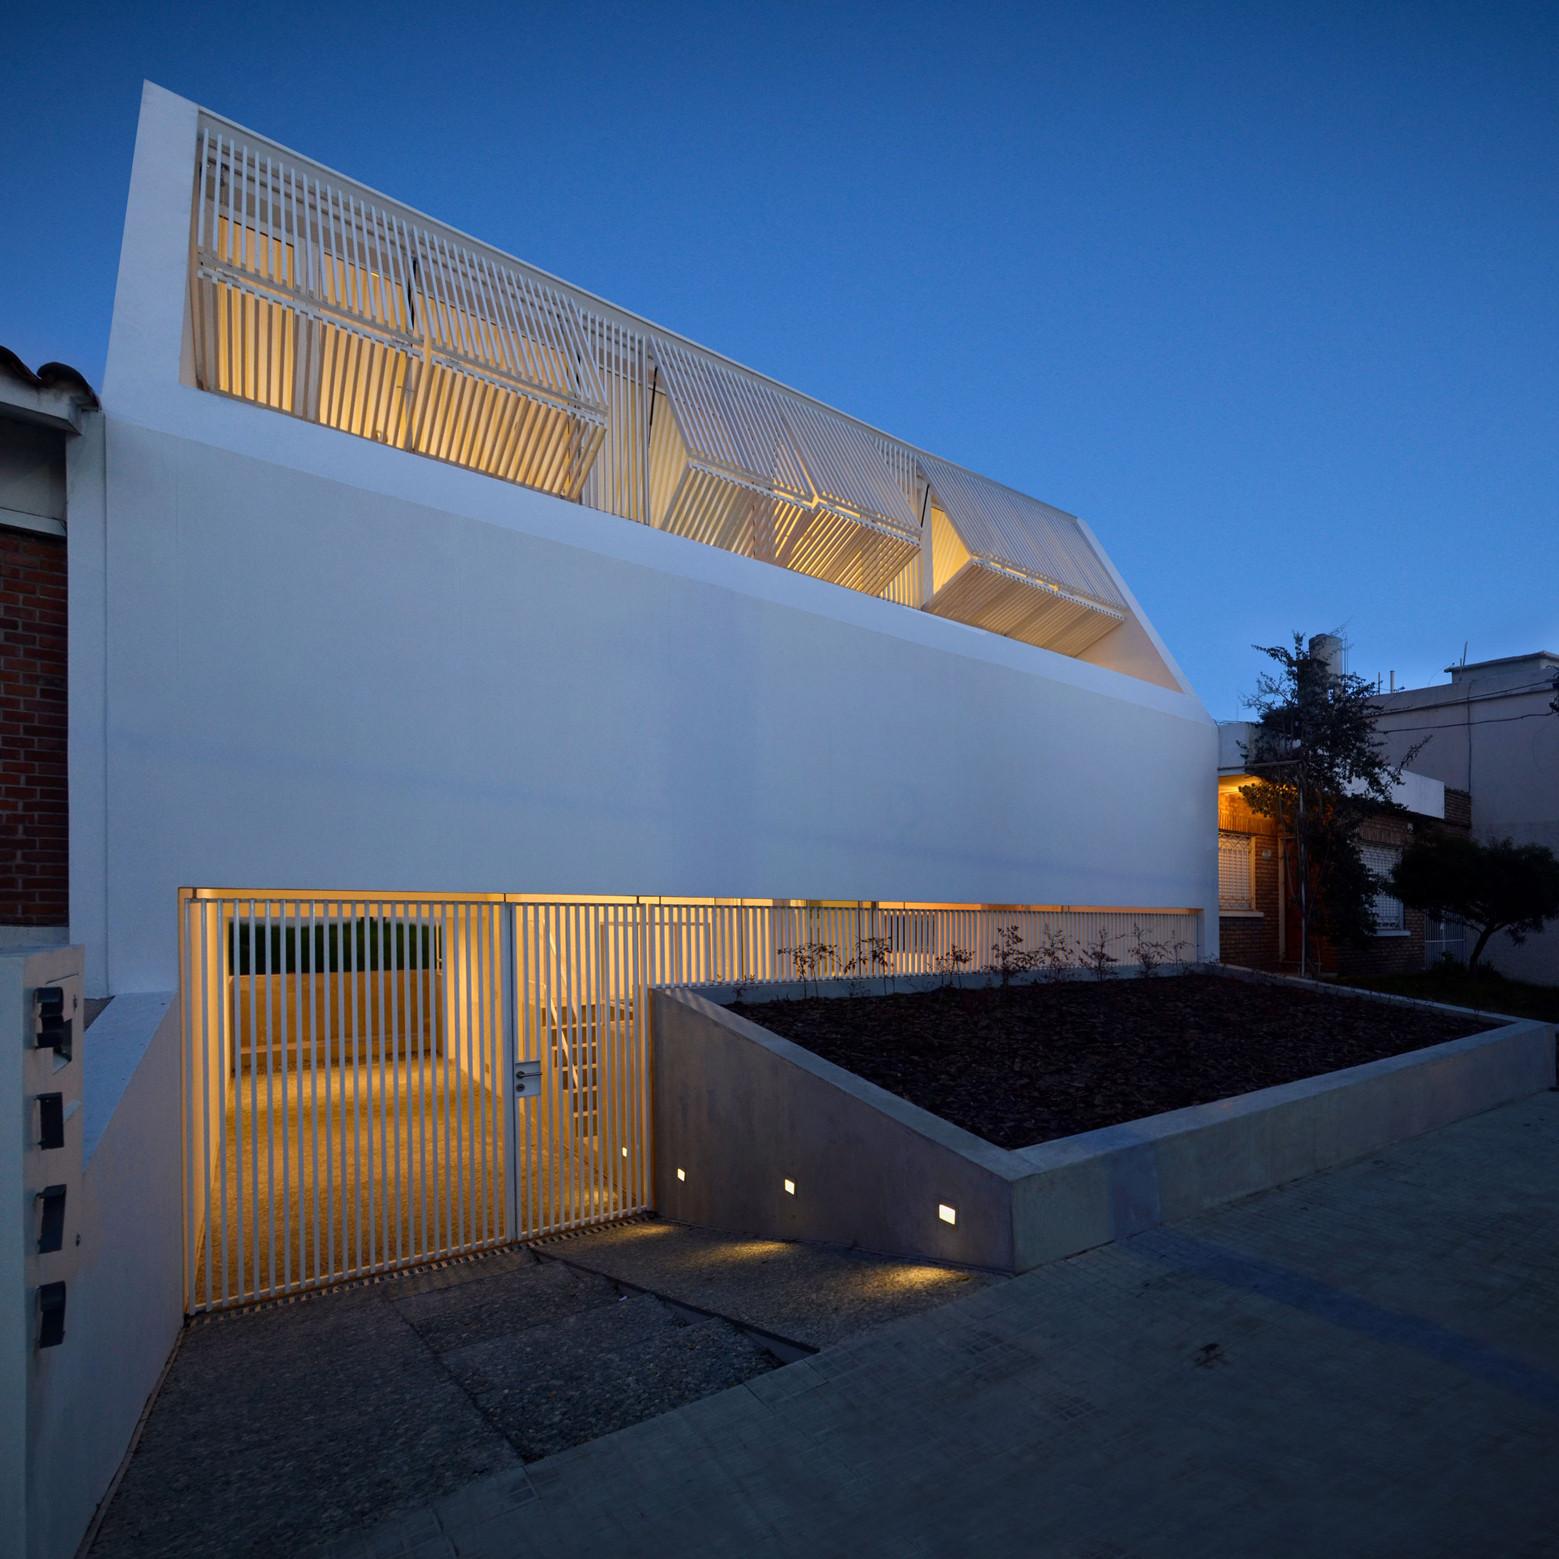 Casa Rifa 2006. Image © Elías Martinez Ojeda